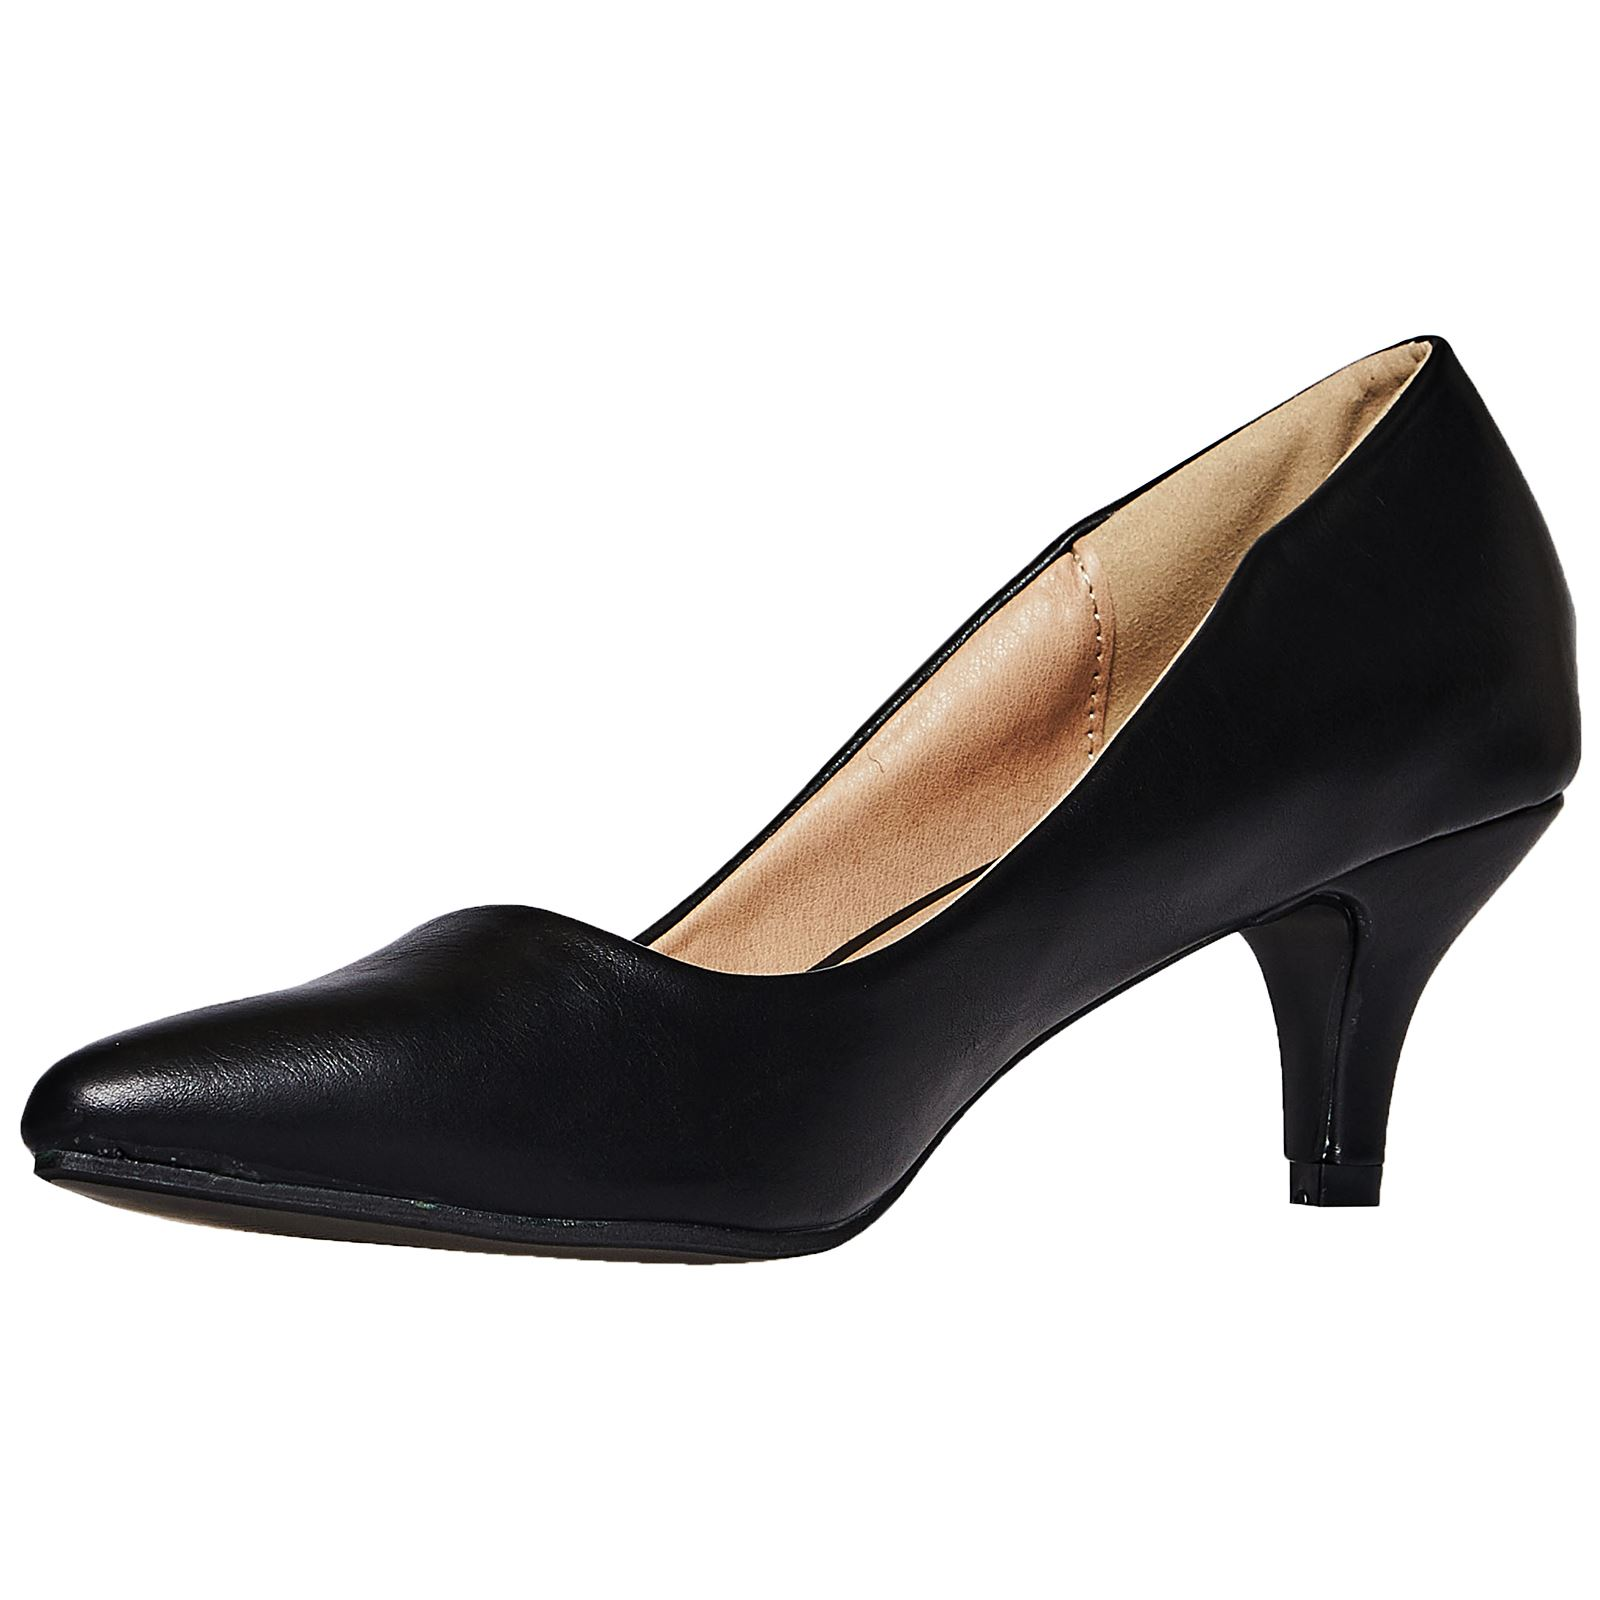 e6973915720b5 Miranda Womens Low Mid Kitten Heels Slip On Court Shoes Ladies Pumps ...